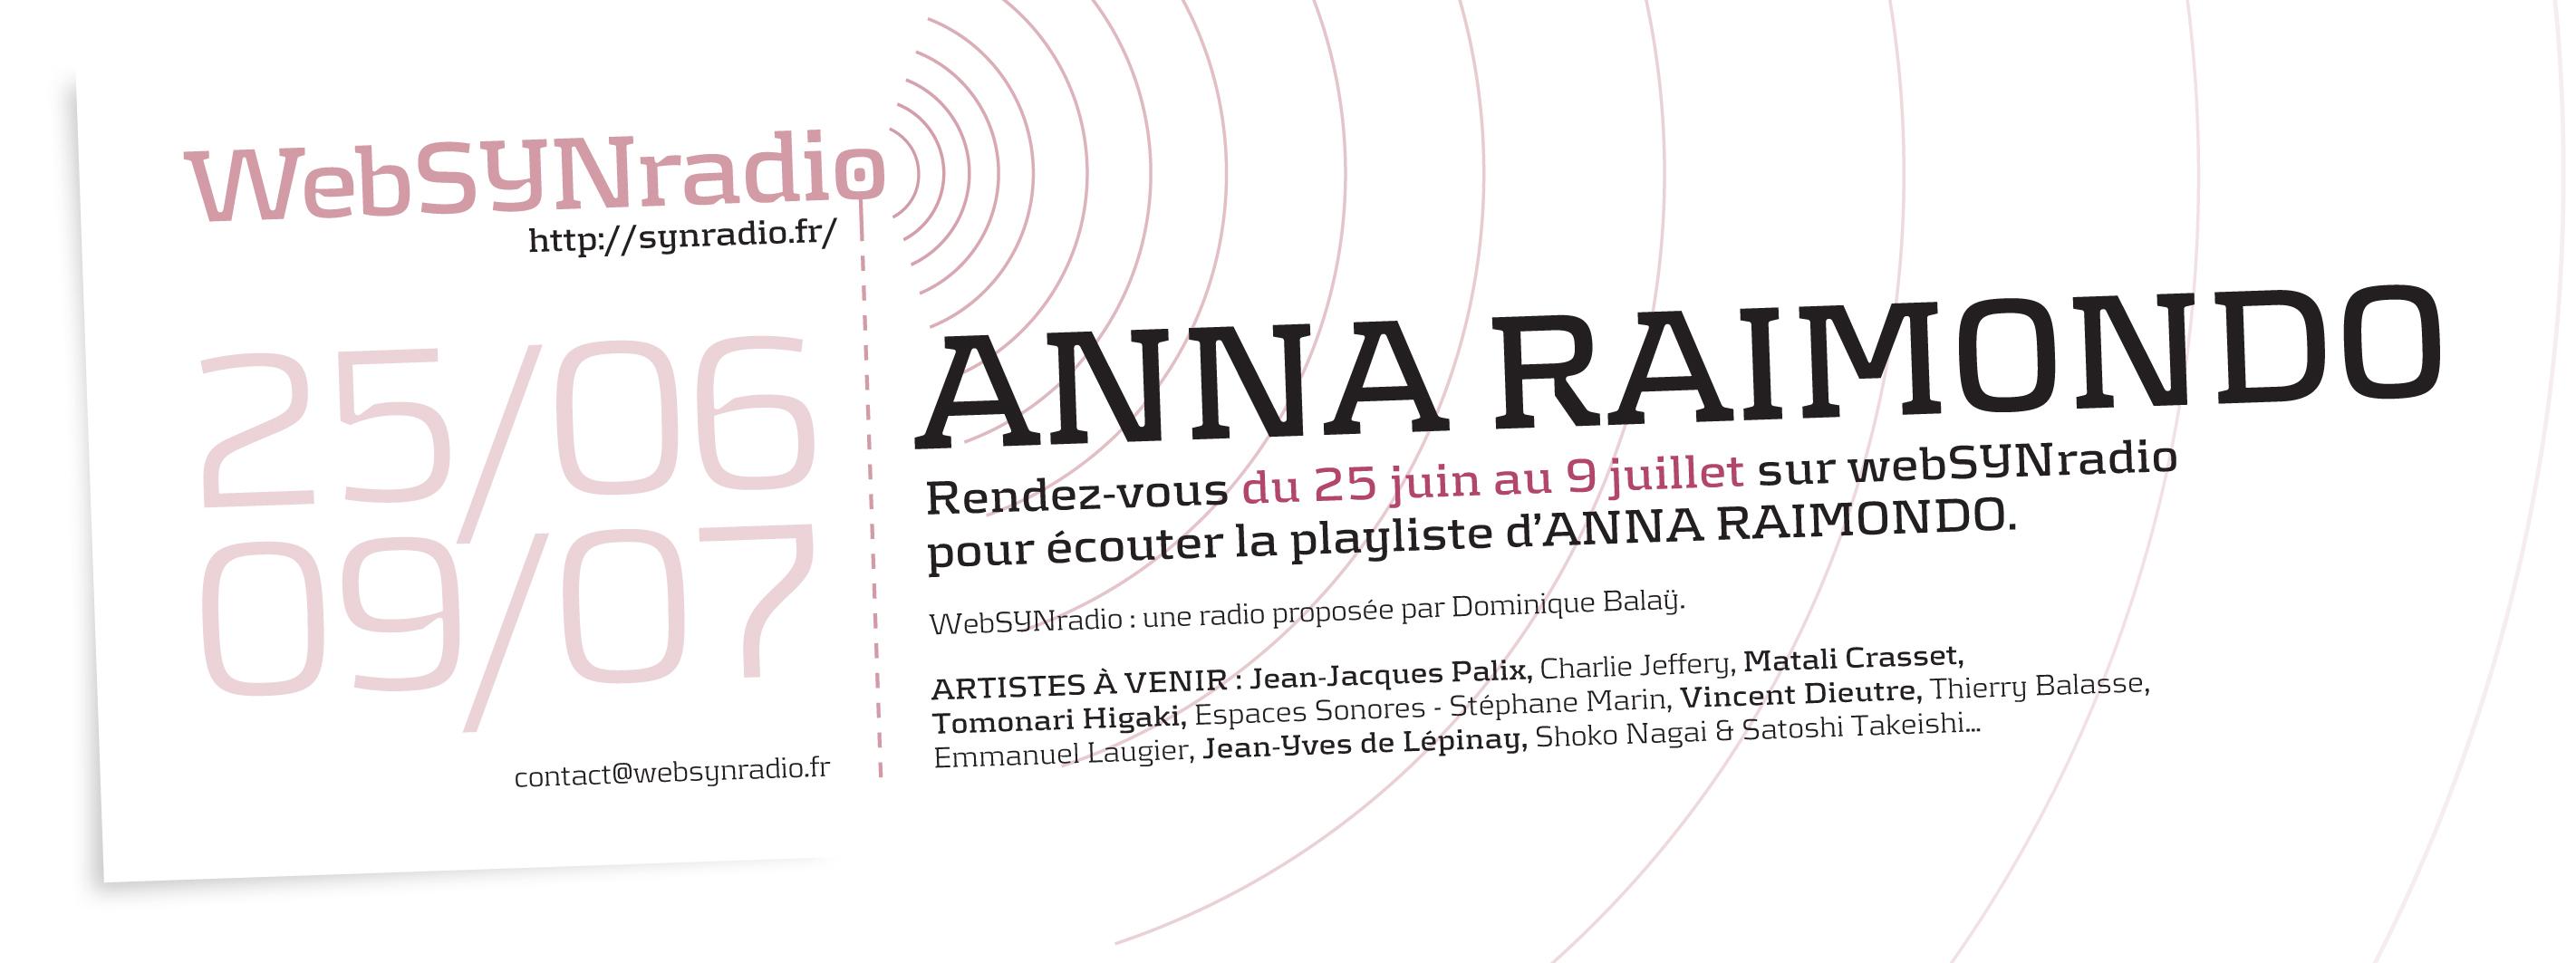 Anna-RAIMONDO websynradio